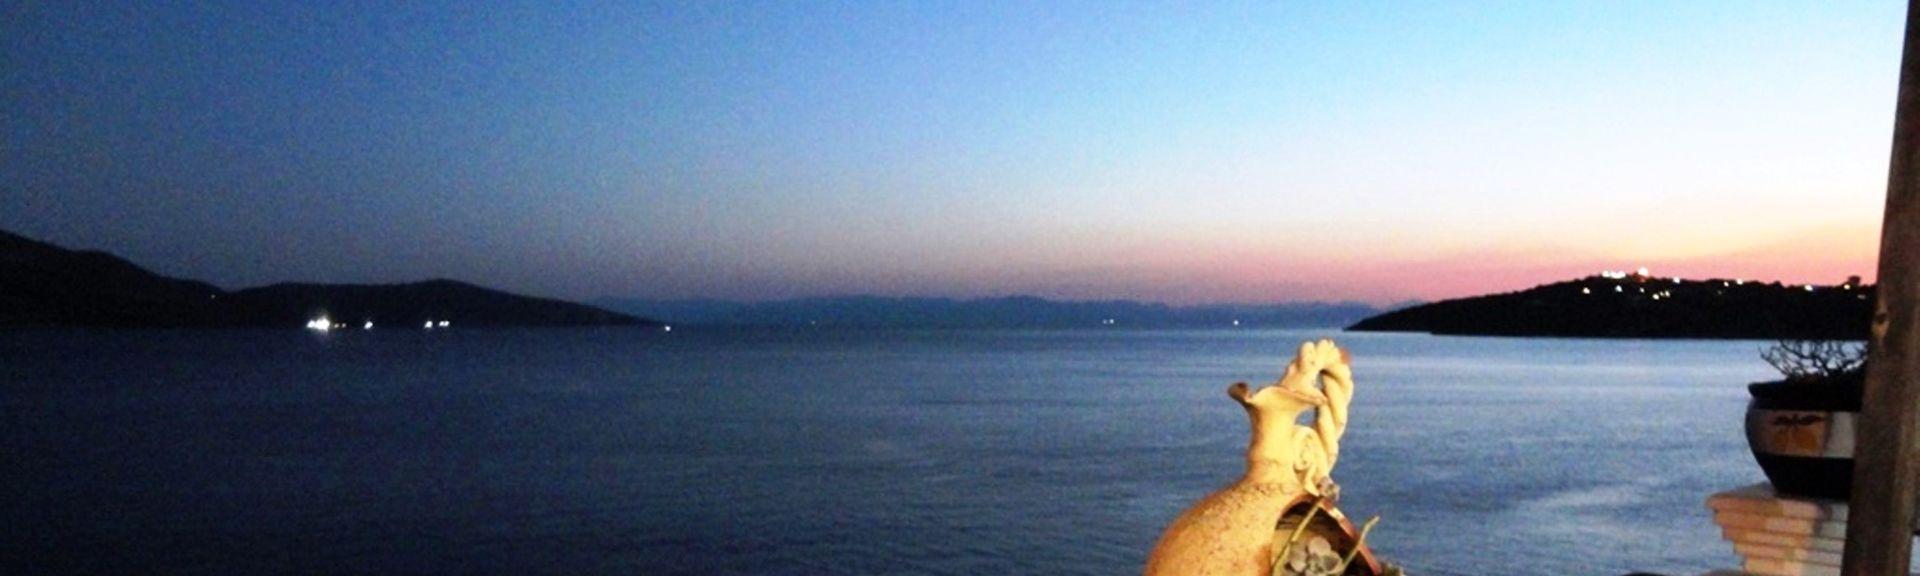 Mandra Idillia, Grekland